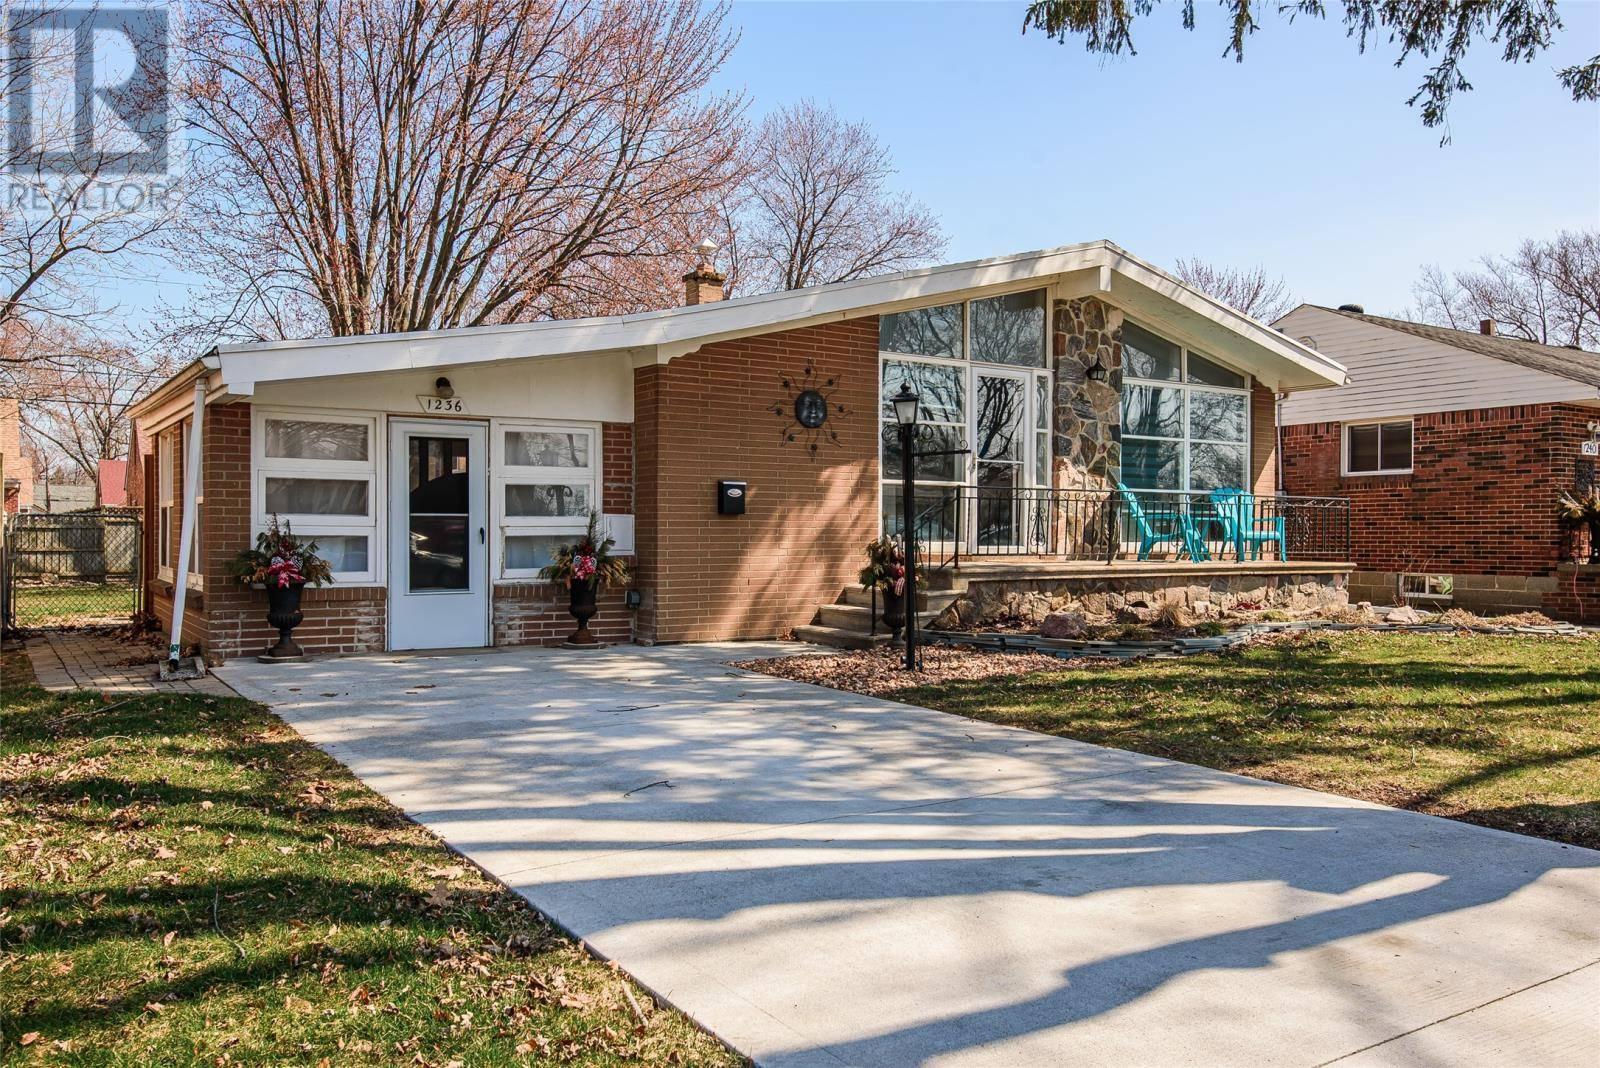 House for sale at 1236 Belleperche Pl Windsor Ontario - MLS: 20003883